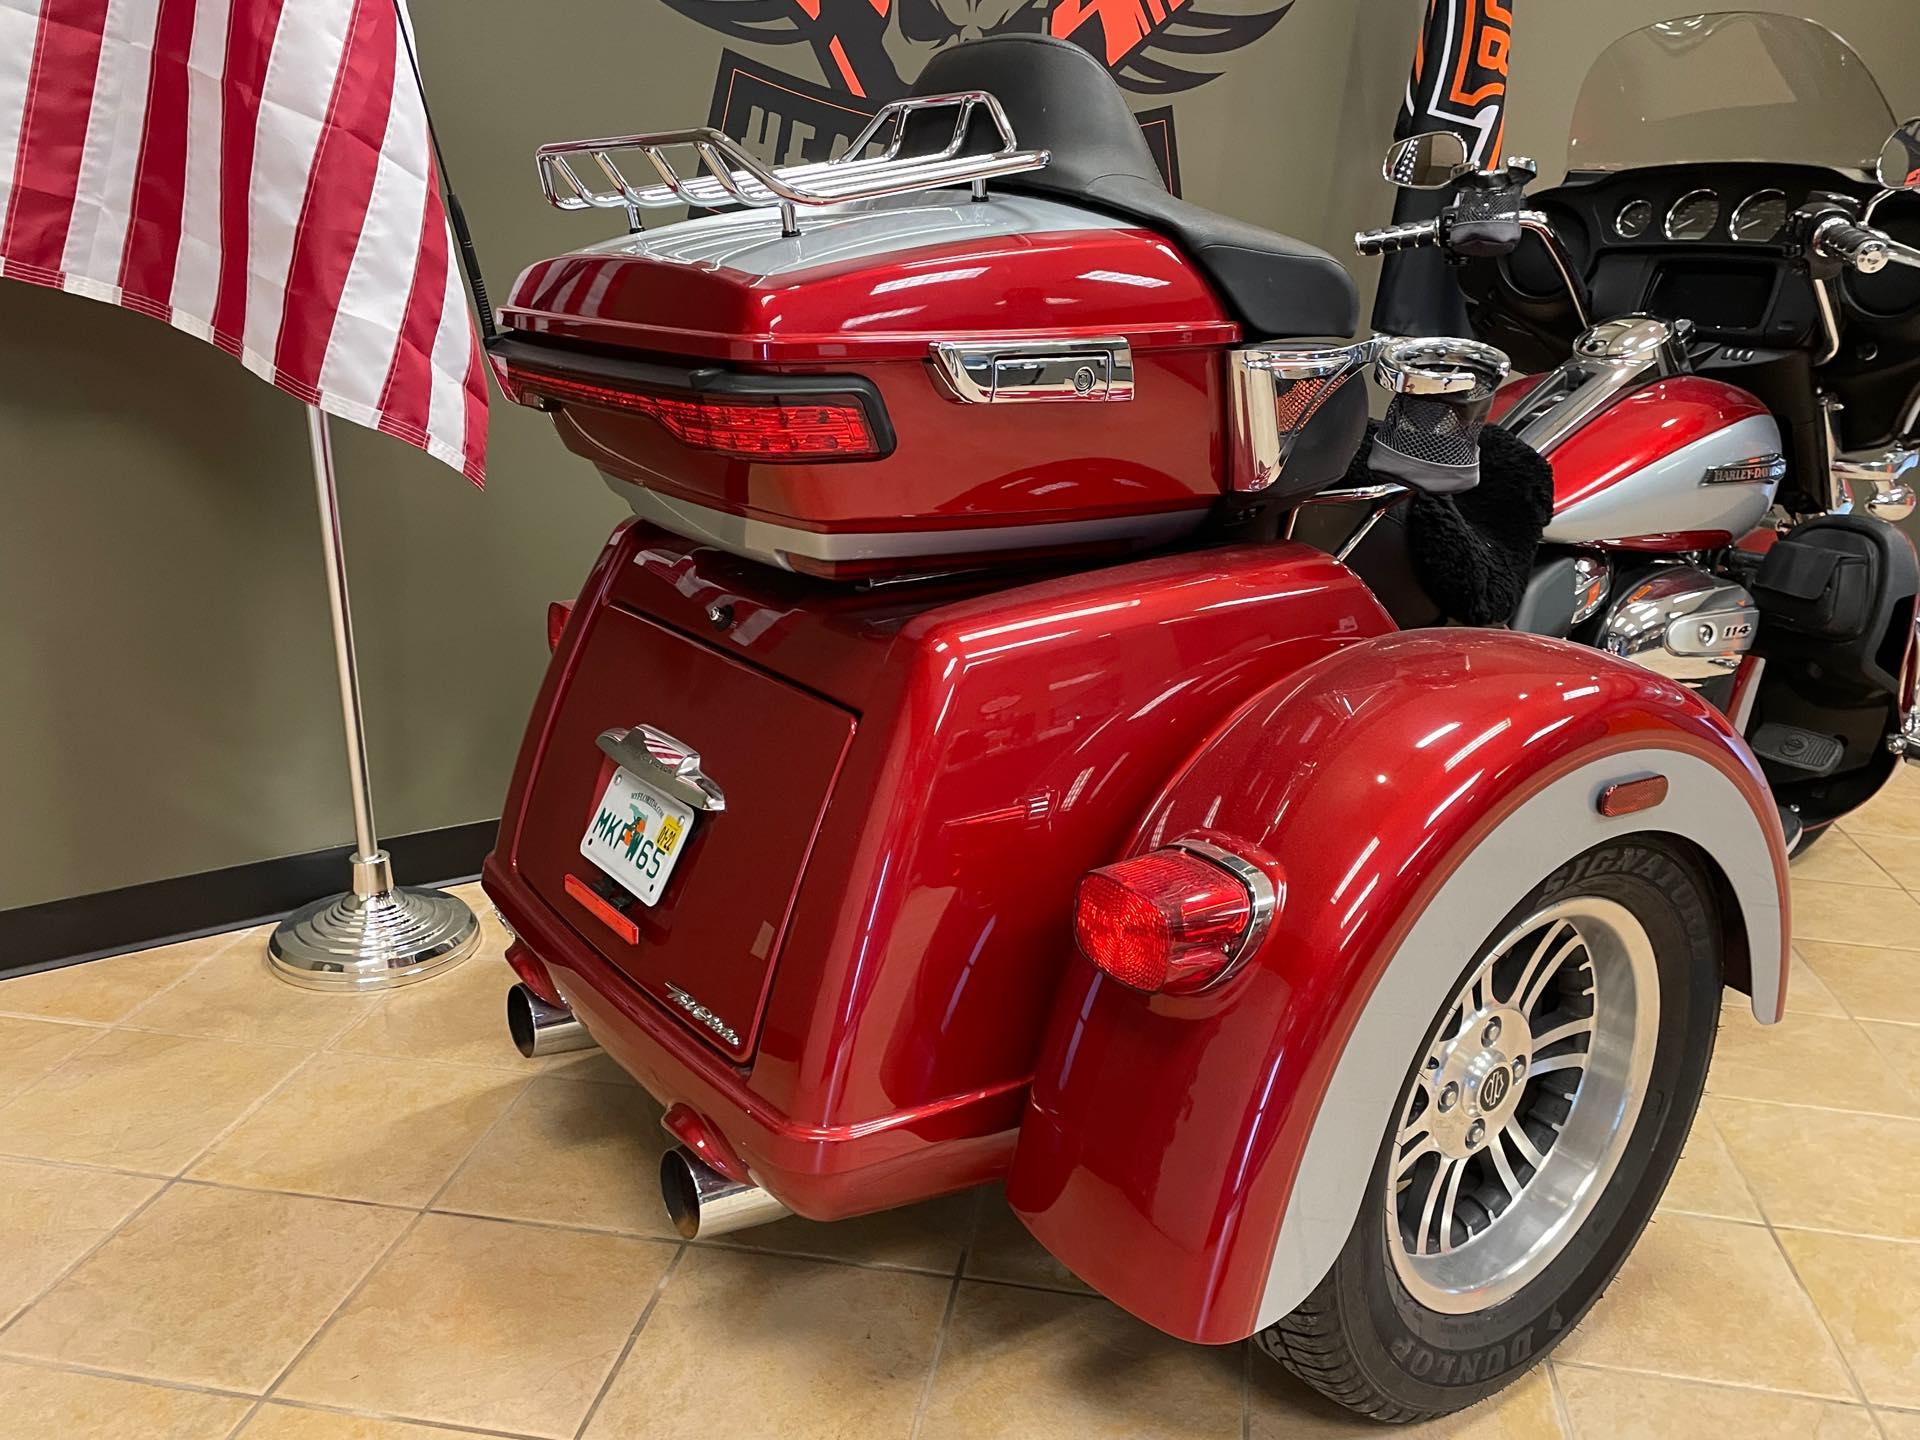 2019 Harley-Davidson Trike Tri Glide Ultra at Loess Hills Harley-Davidson